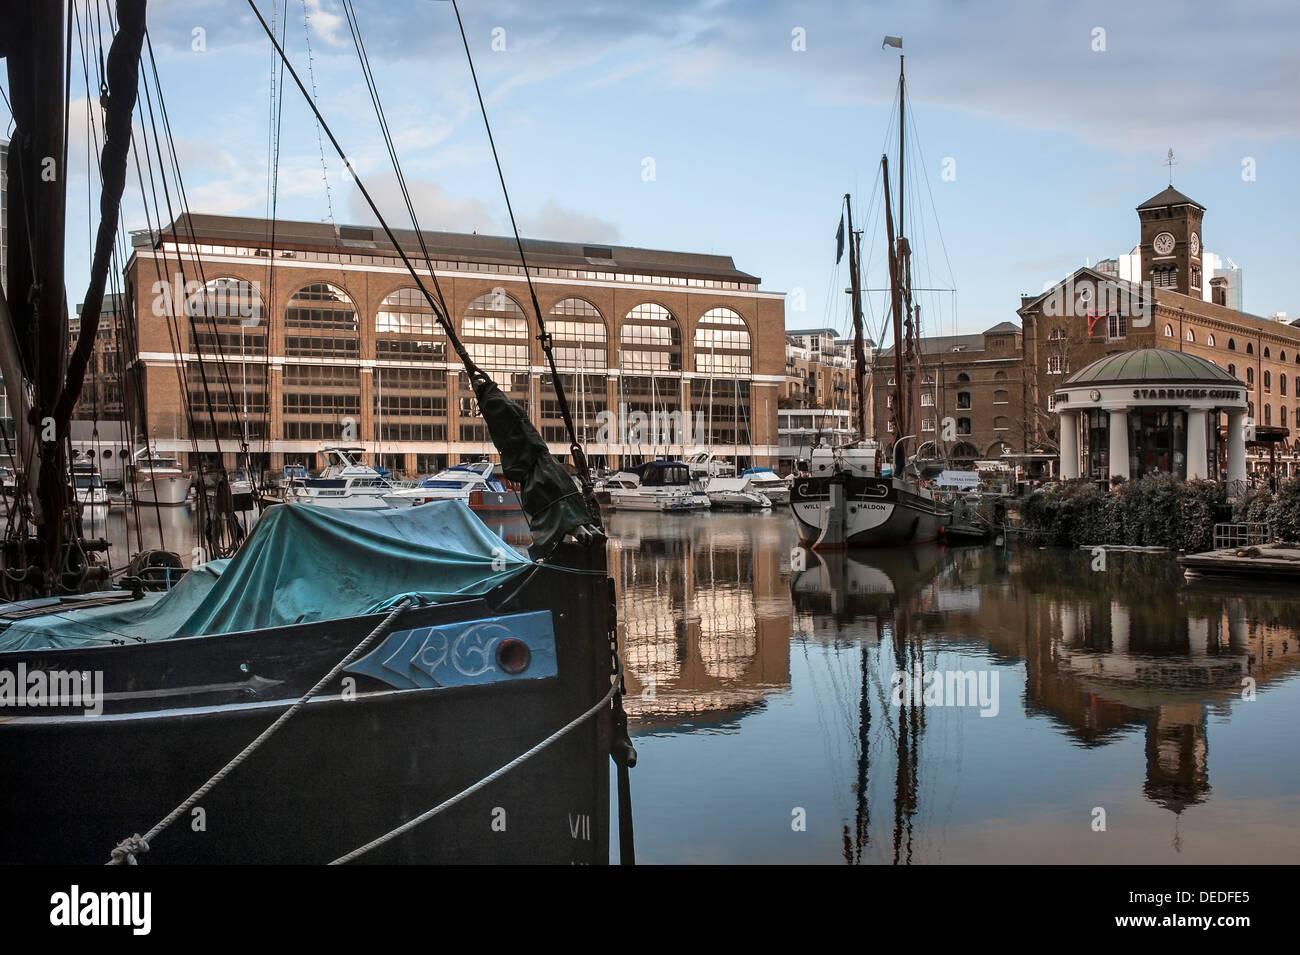 St Katharine Dock, City of London - Stock Image